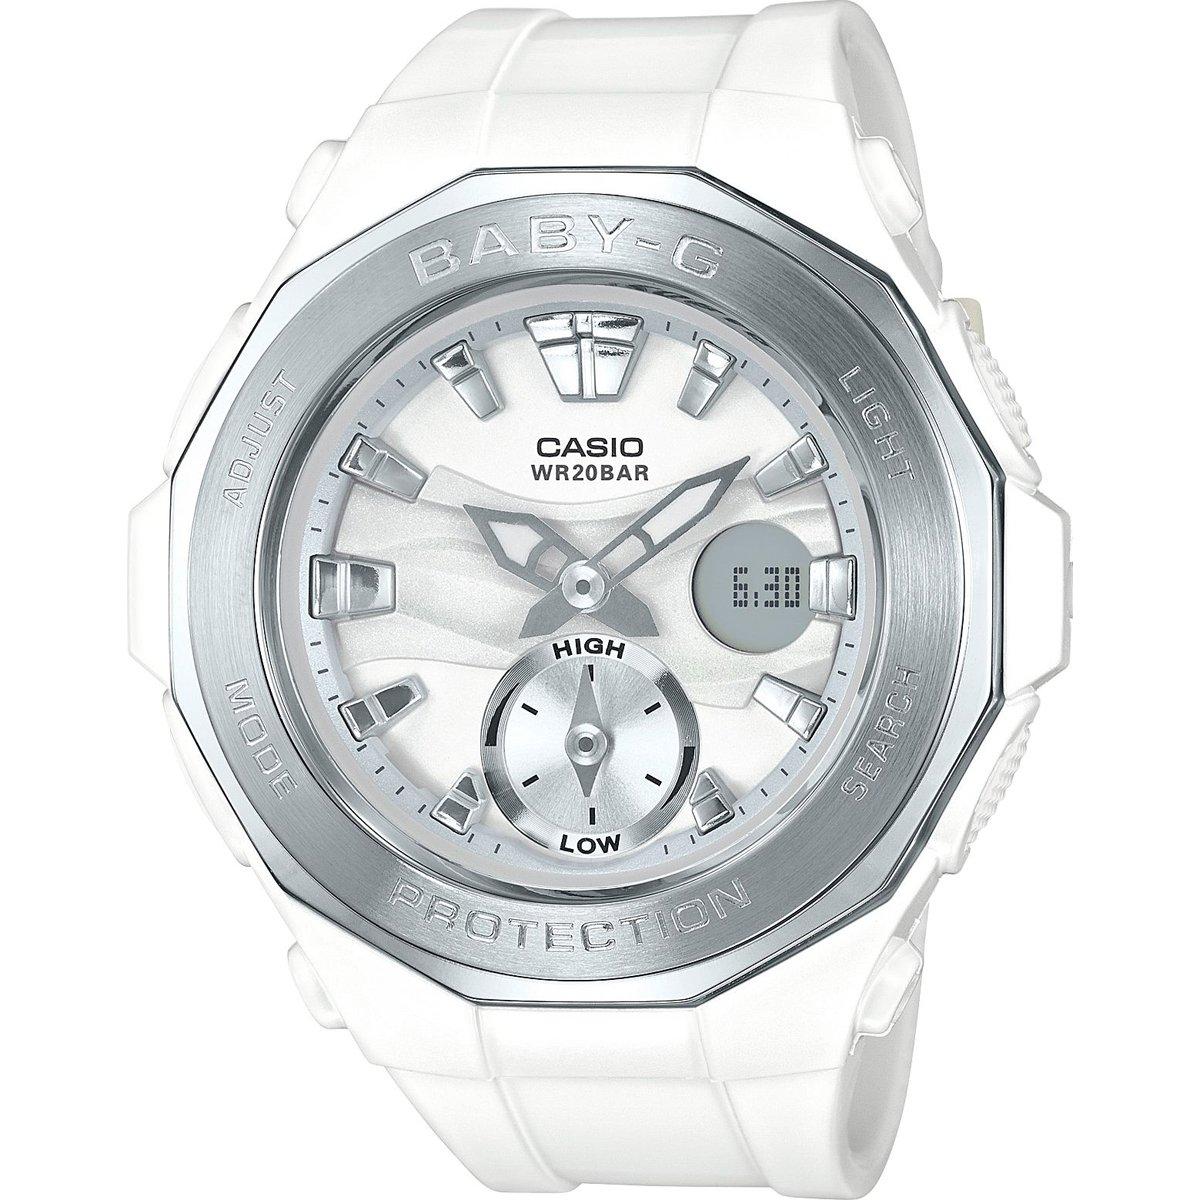 G-Shock BGA-220-7A Wht/Silver Silver Bezel - White Silver / One Size